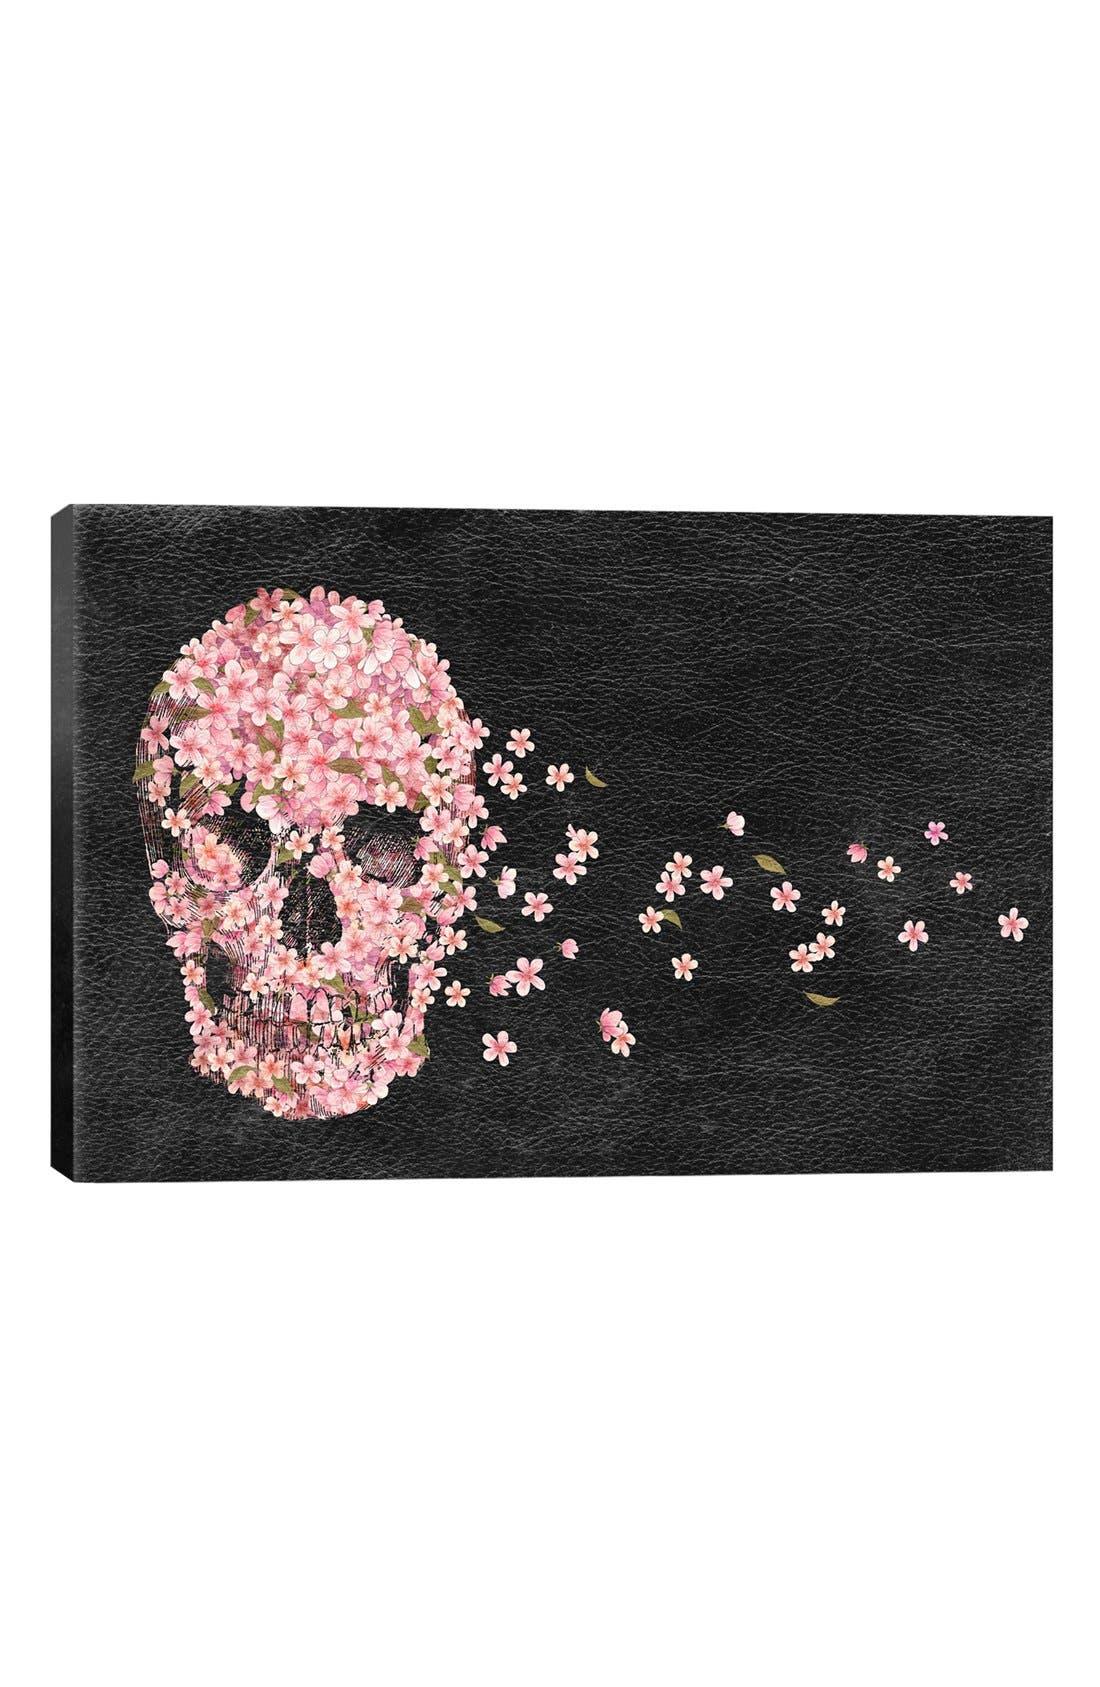 ICANVAS 'A Beautiful Death' Leather Art Print